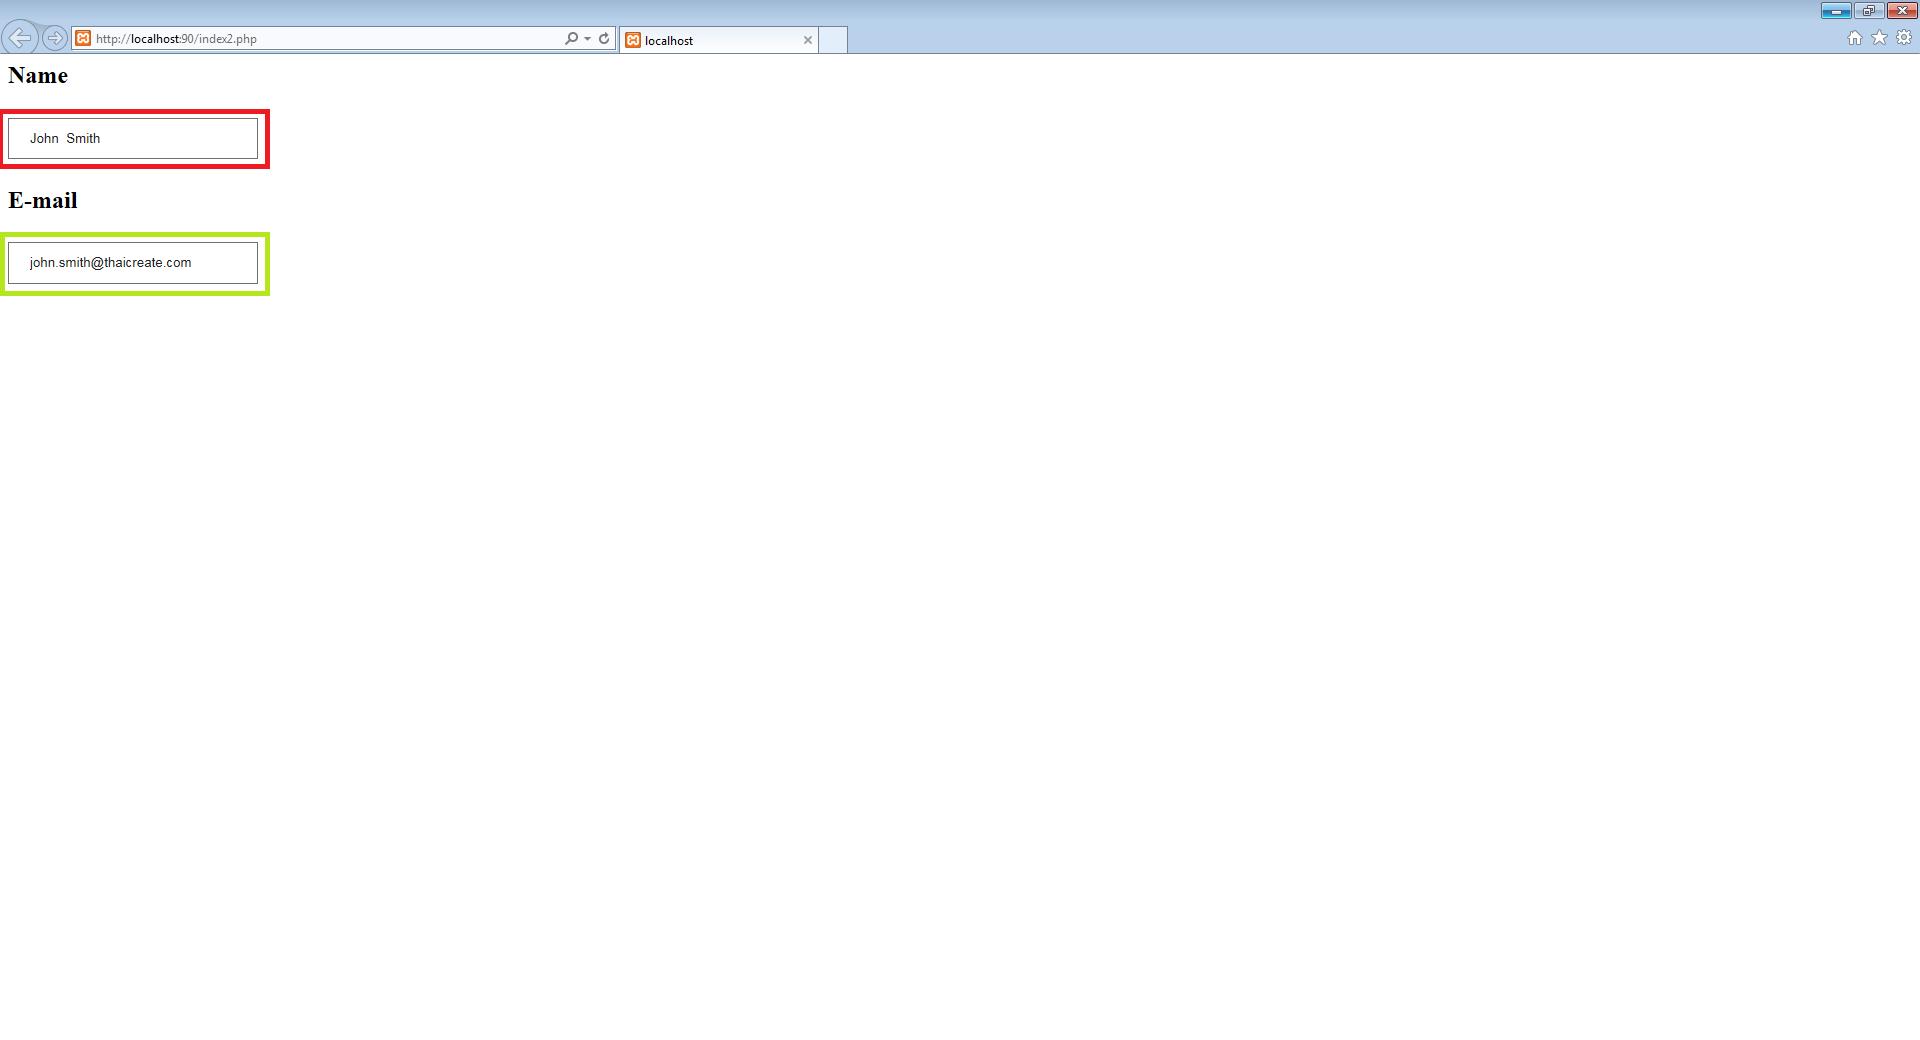 ss datalist